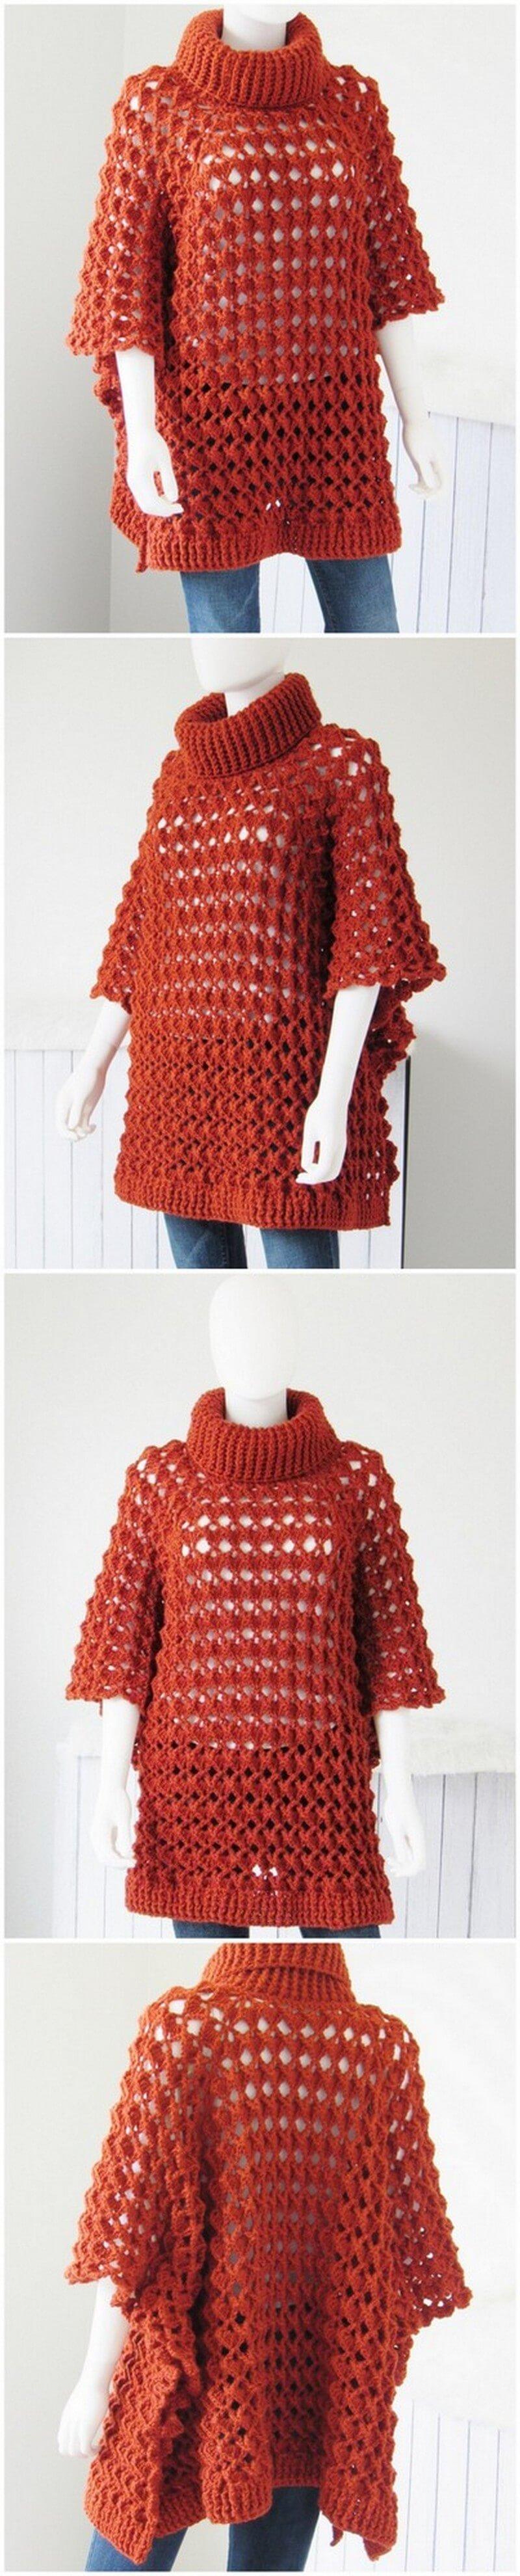 Crochet Poncho Pattern (31)